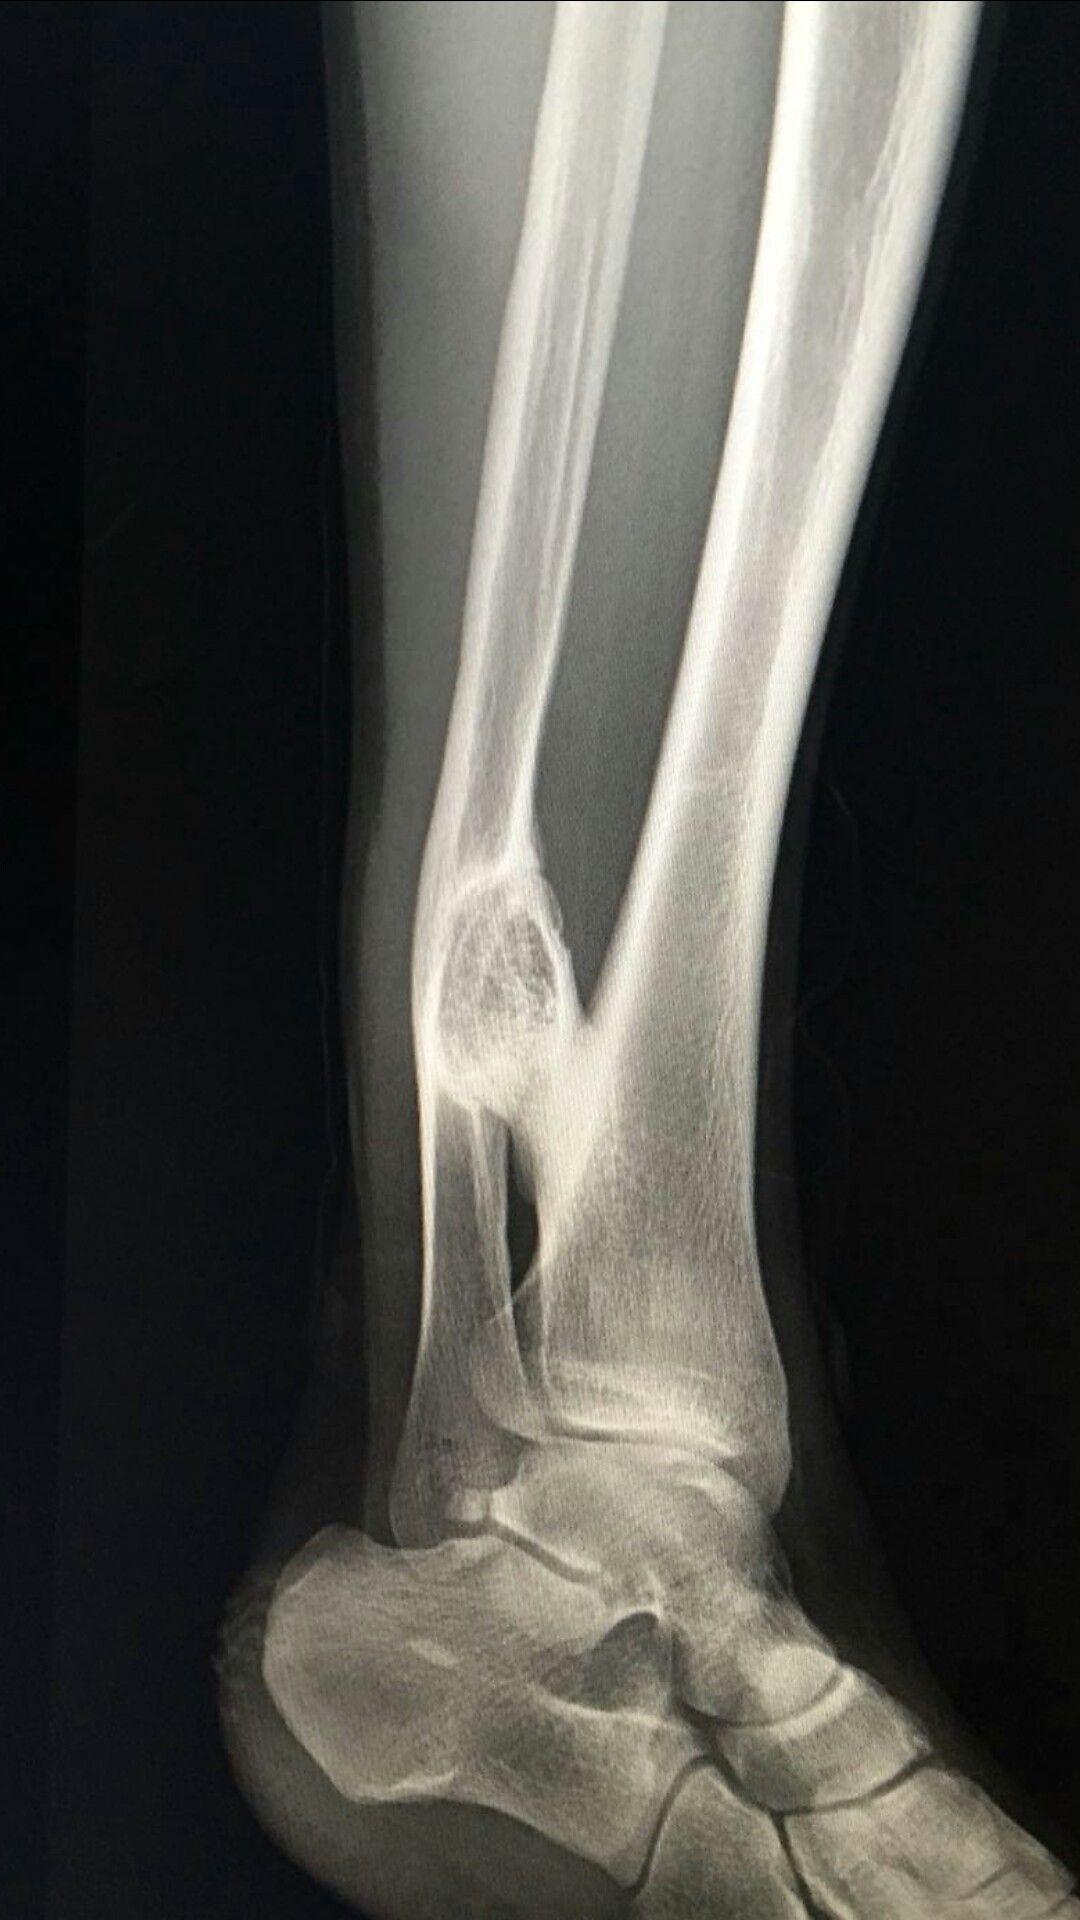 Osteokondrom Radiology, Radiologic technology, Radiology